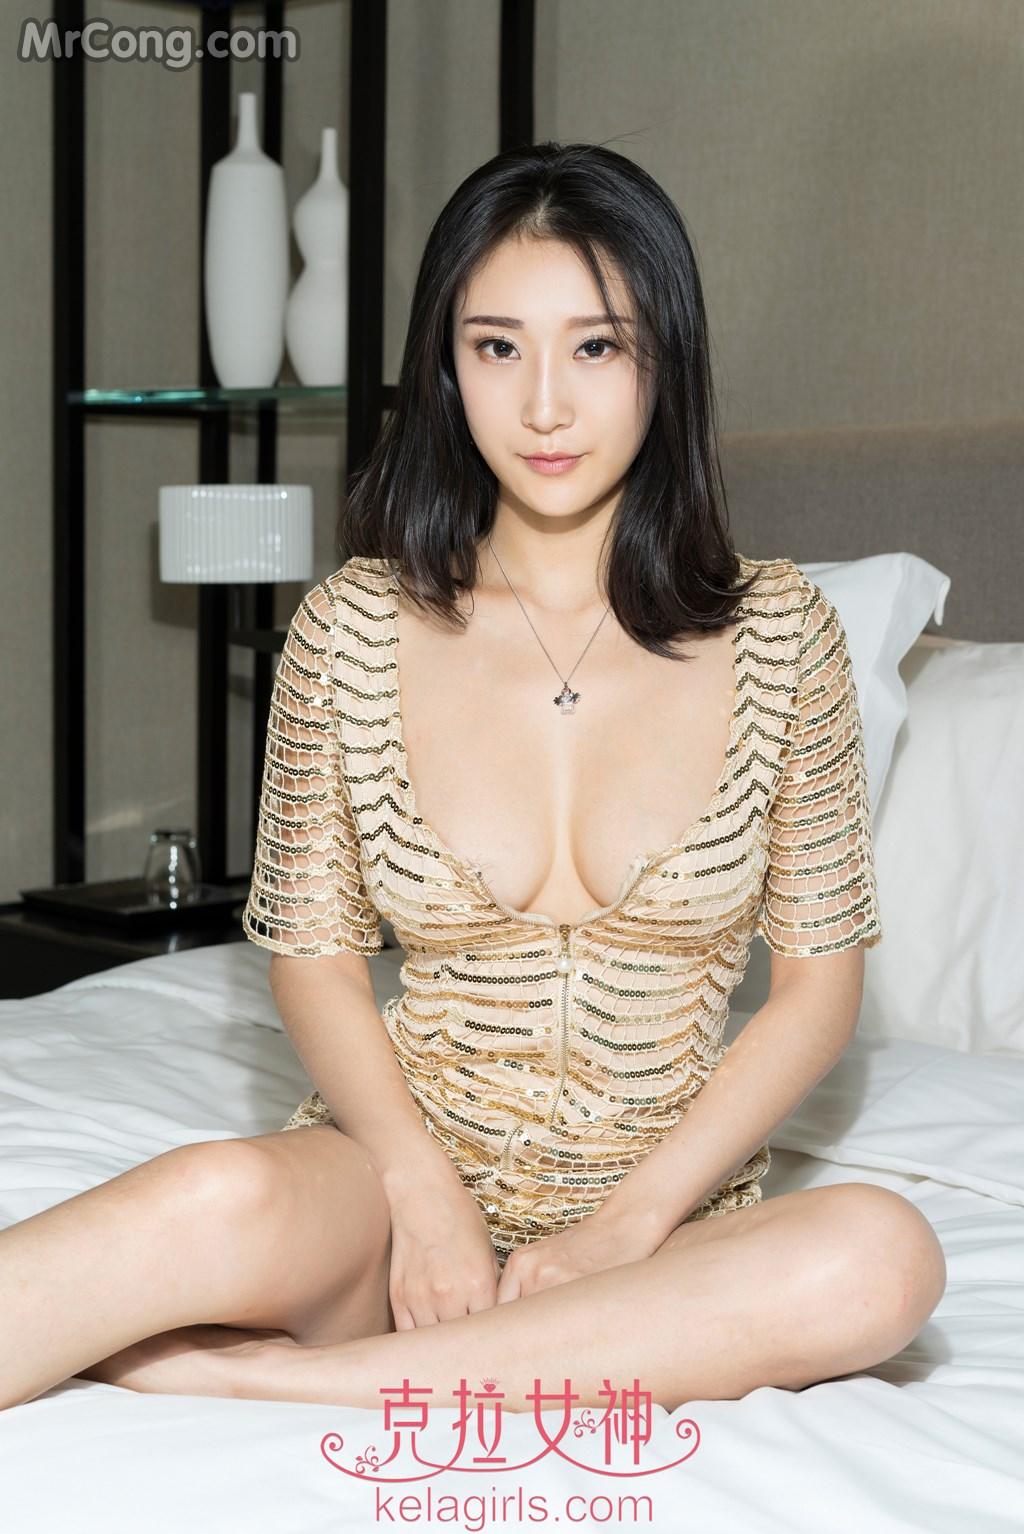 KelaGirls 2017-03-04: Người mẫu Han Yan (含嫣) (35 ảnh)